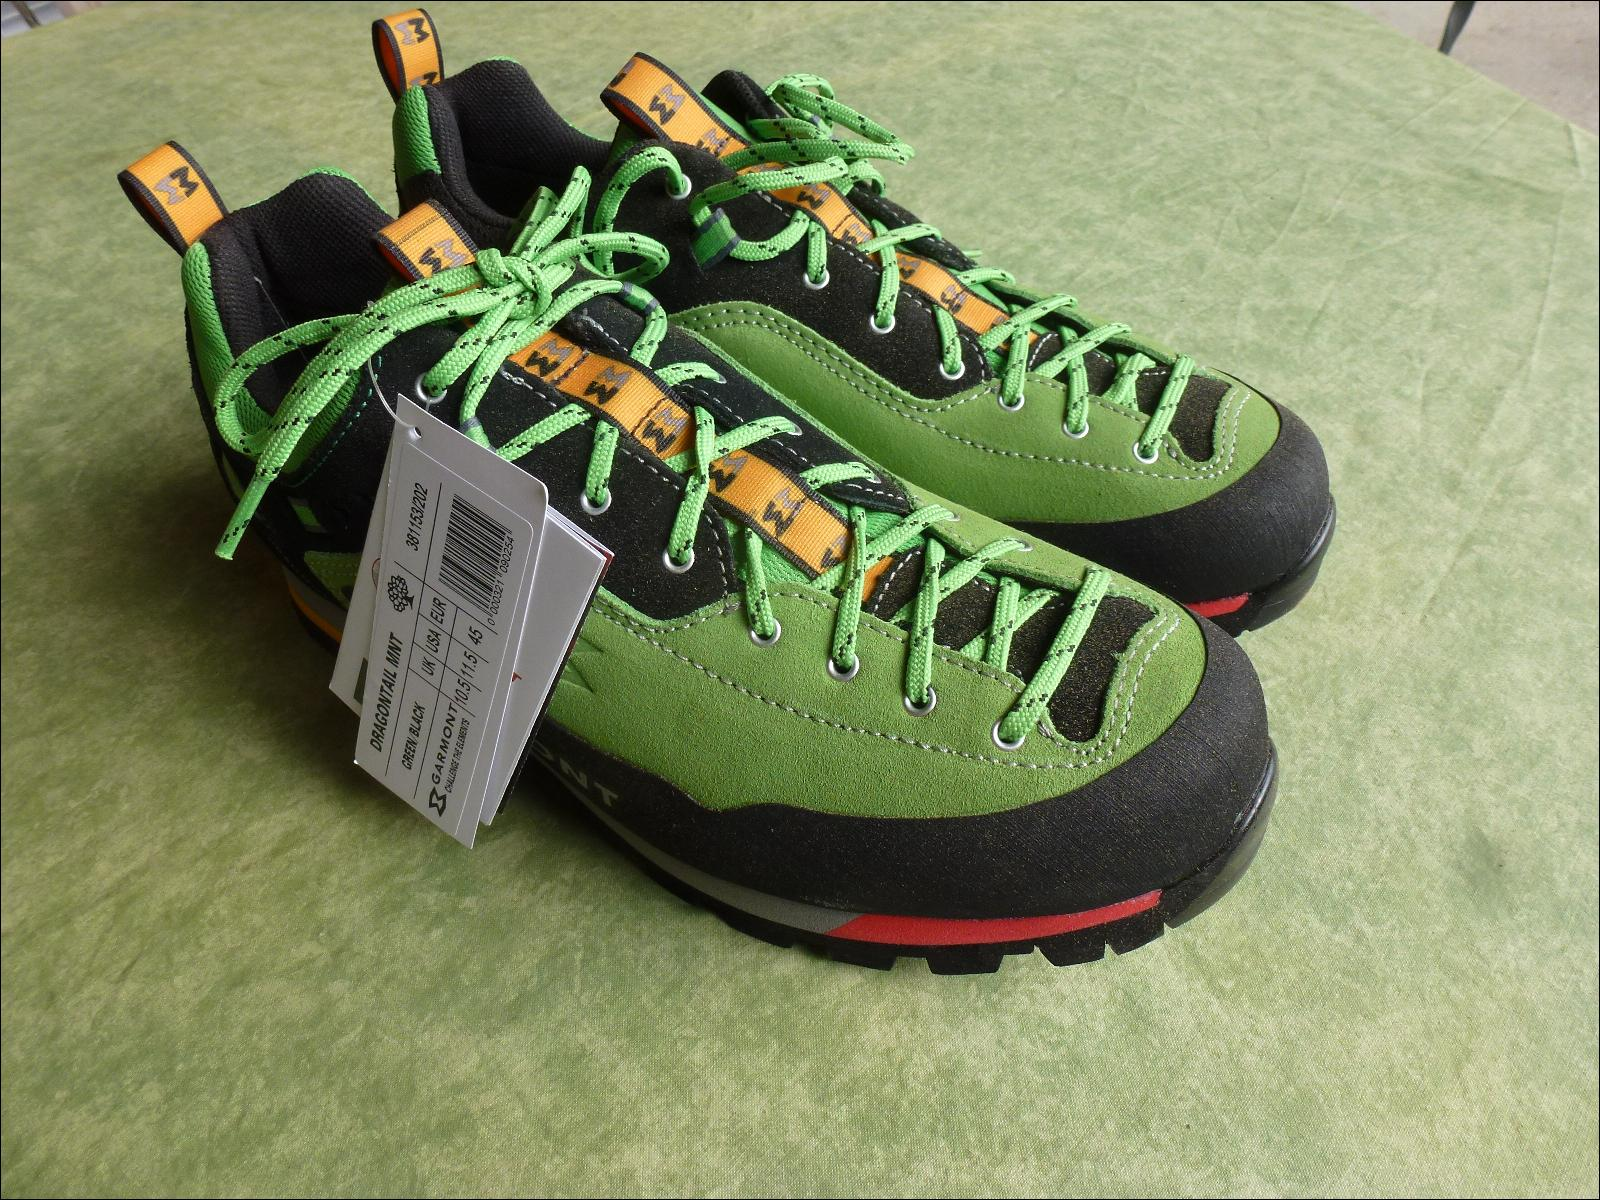 2701abcf28 Chaussures d'approche et escalade Garmont dragontail GMT